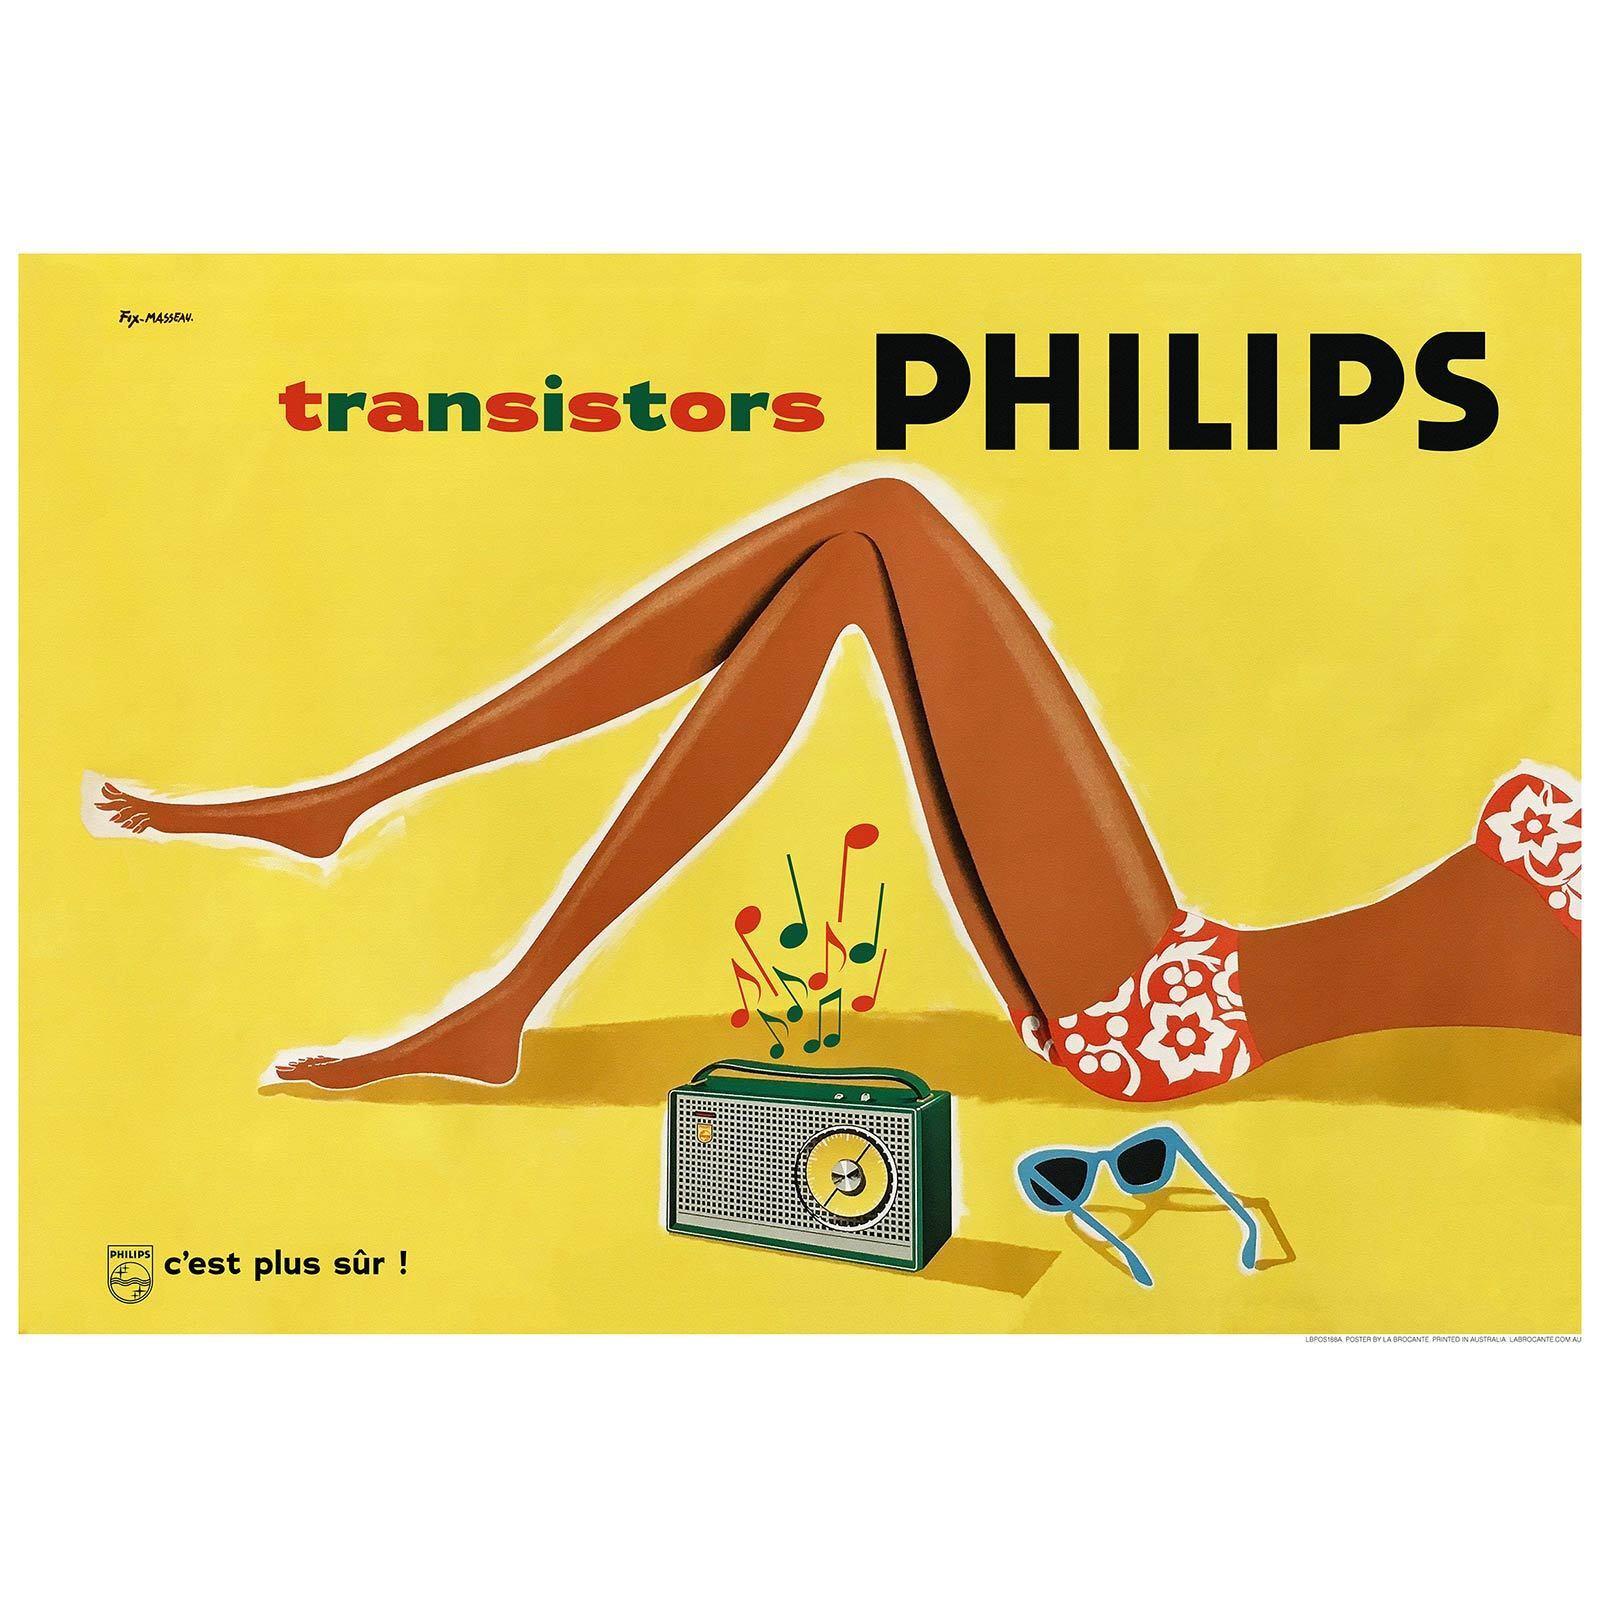 Philips Transistors Retro Print - Vintage AdGrünising Poster - 5 Größes & Framing